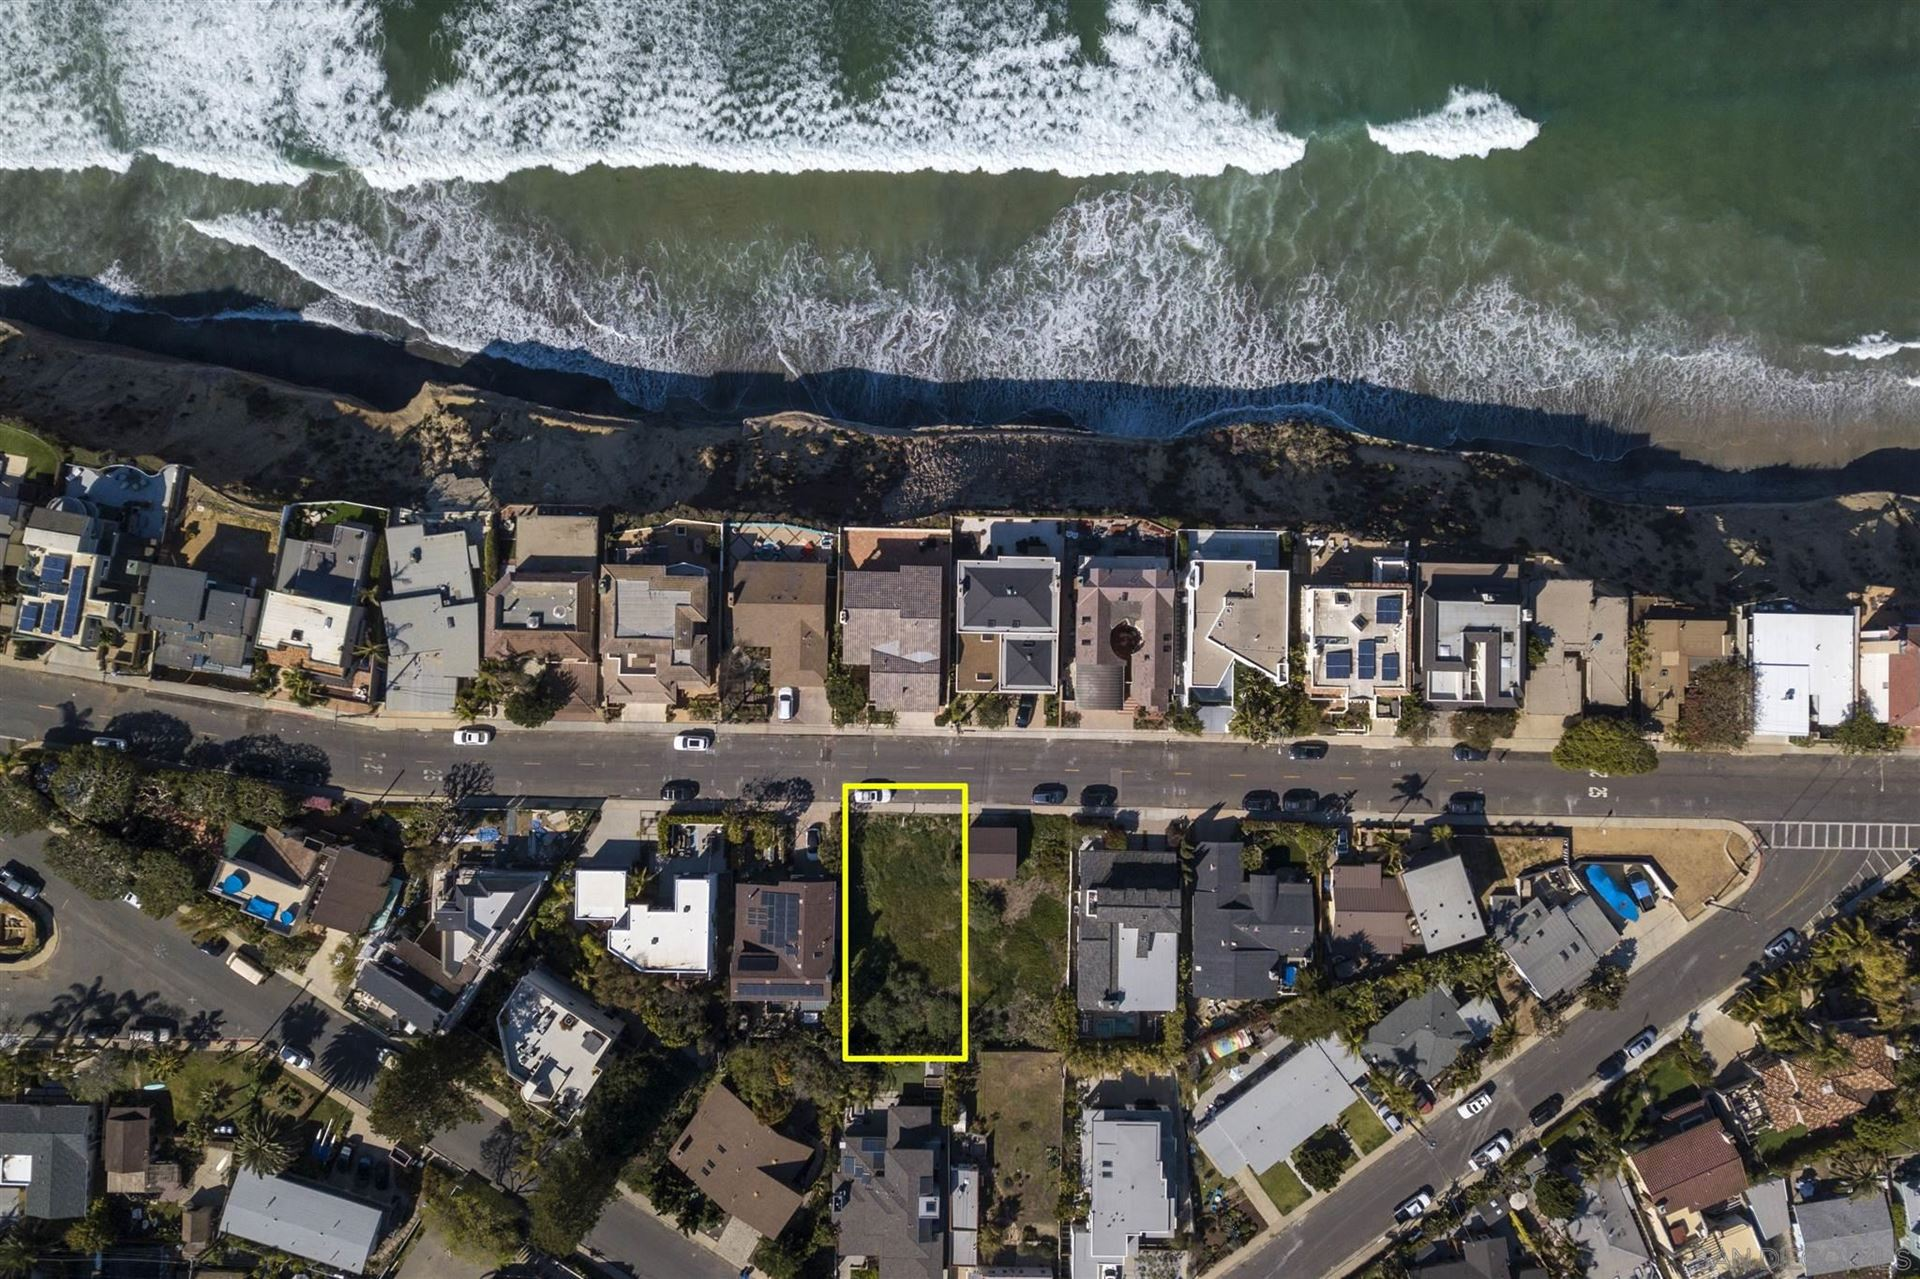 Photo of Lot 14 Pacific Avenue, Solana Beach, CA 92075 (MLS # 210008290)